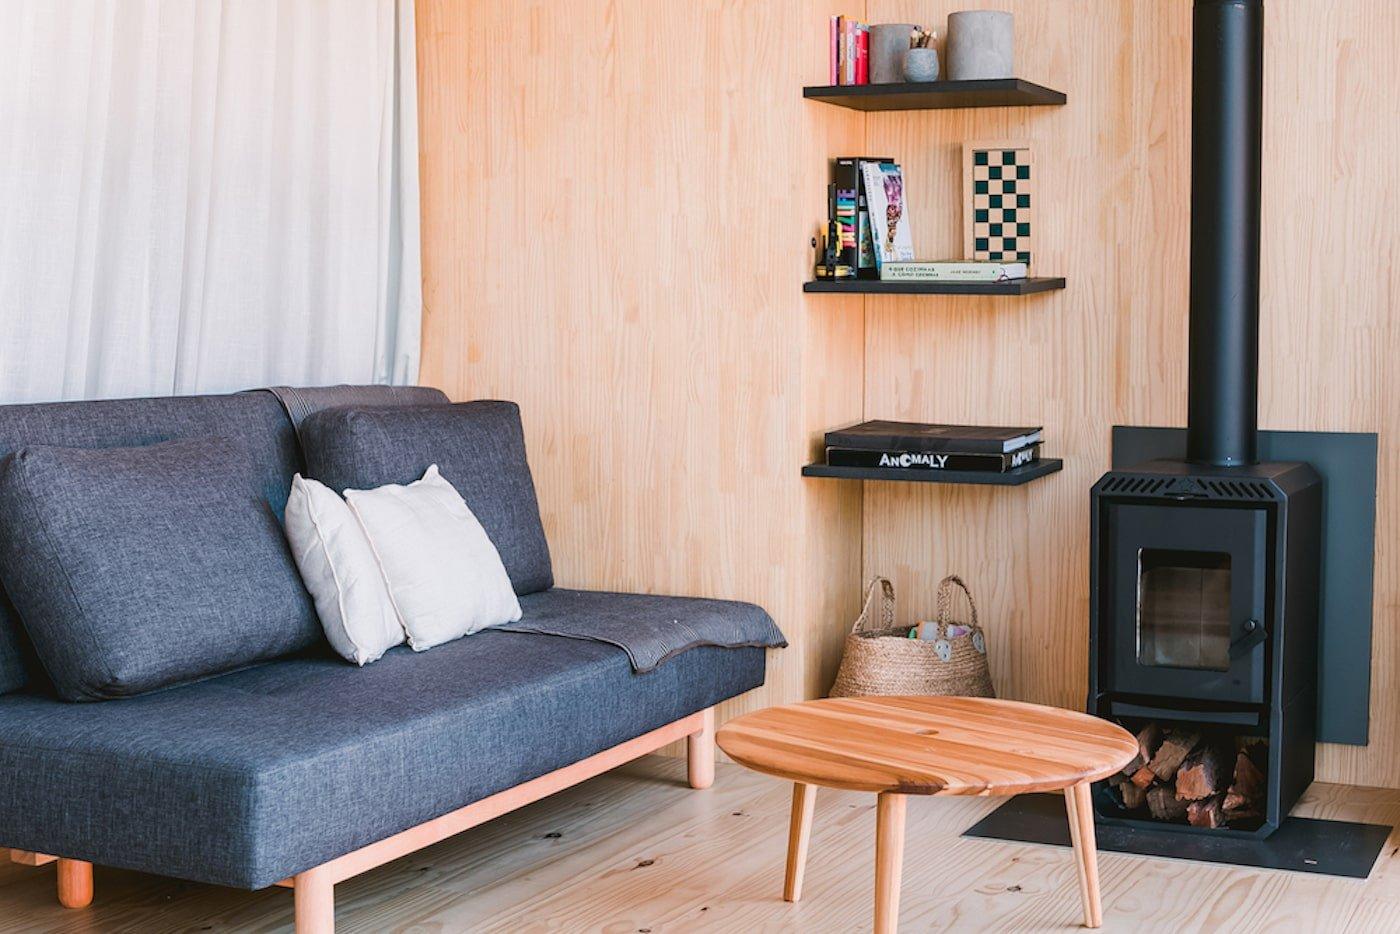 Eco Edition_SysHaus_LilliHaus_Architecture interiors 7-min